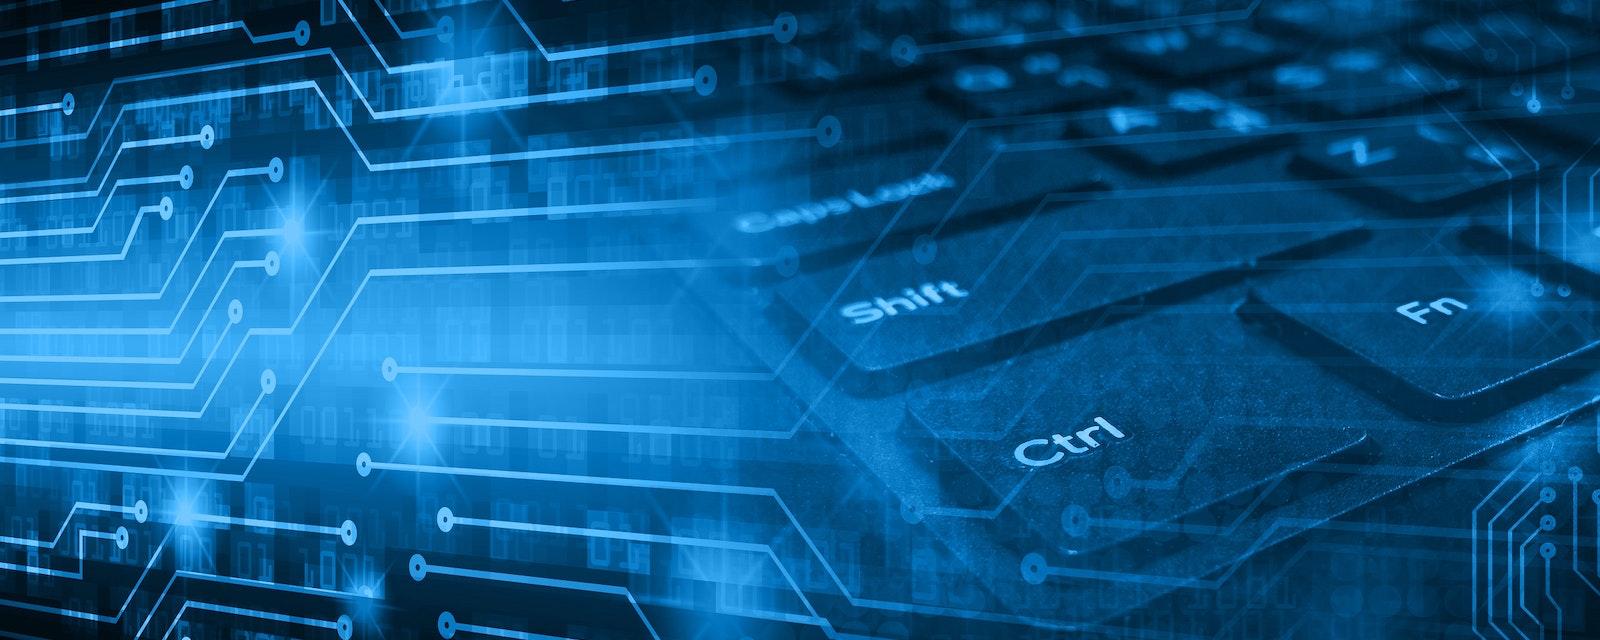 Dark,Blue,Illustration,Of,Technology,Internet,Network,Computer,Background,With